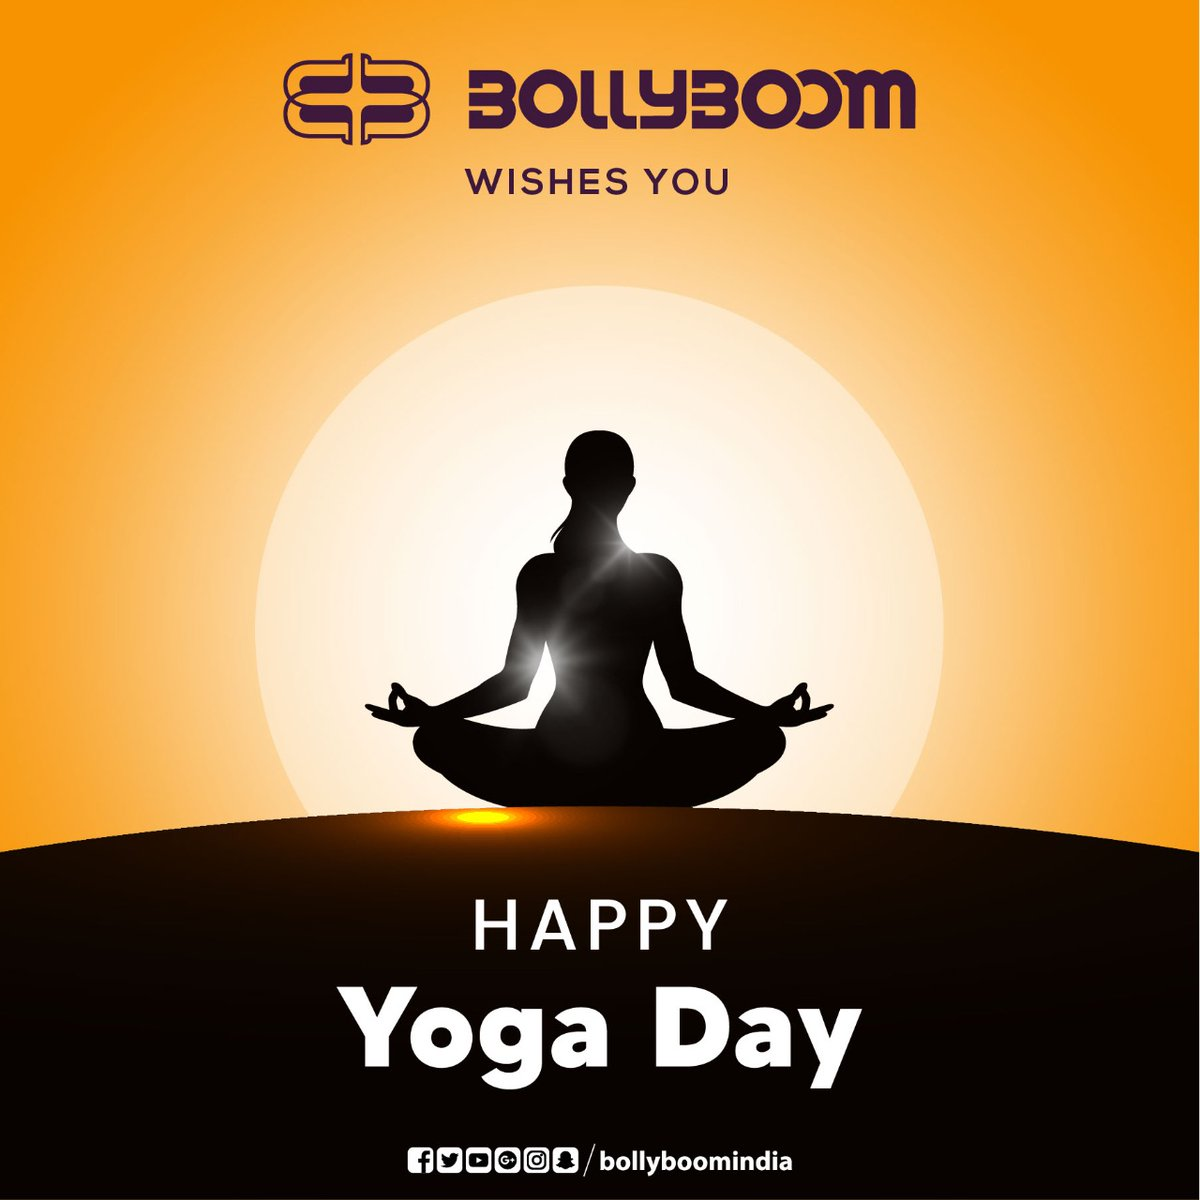 Bollyboom On Twitter India Bollyboom Wishes Everyone A Happy International Yoga Day Stay Fit Stay Safe Perceptemc Yogaday Yogaday2020 Celebration Stayfit Yogaforall Fitness Mentalhealth Quarantine Stayhomestaysafe Fightagainstcorona